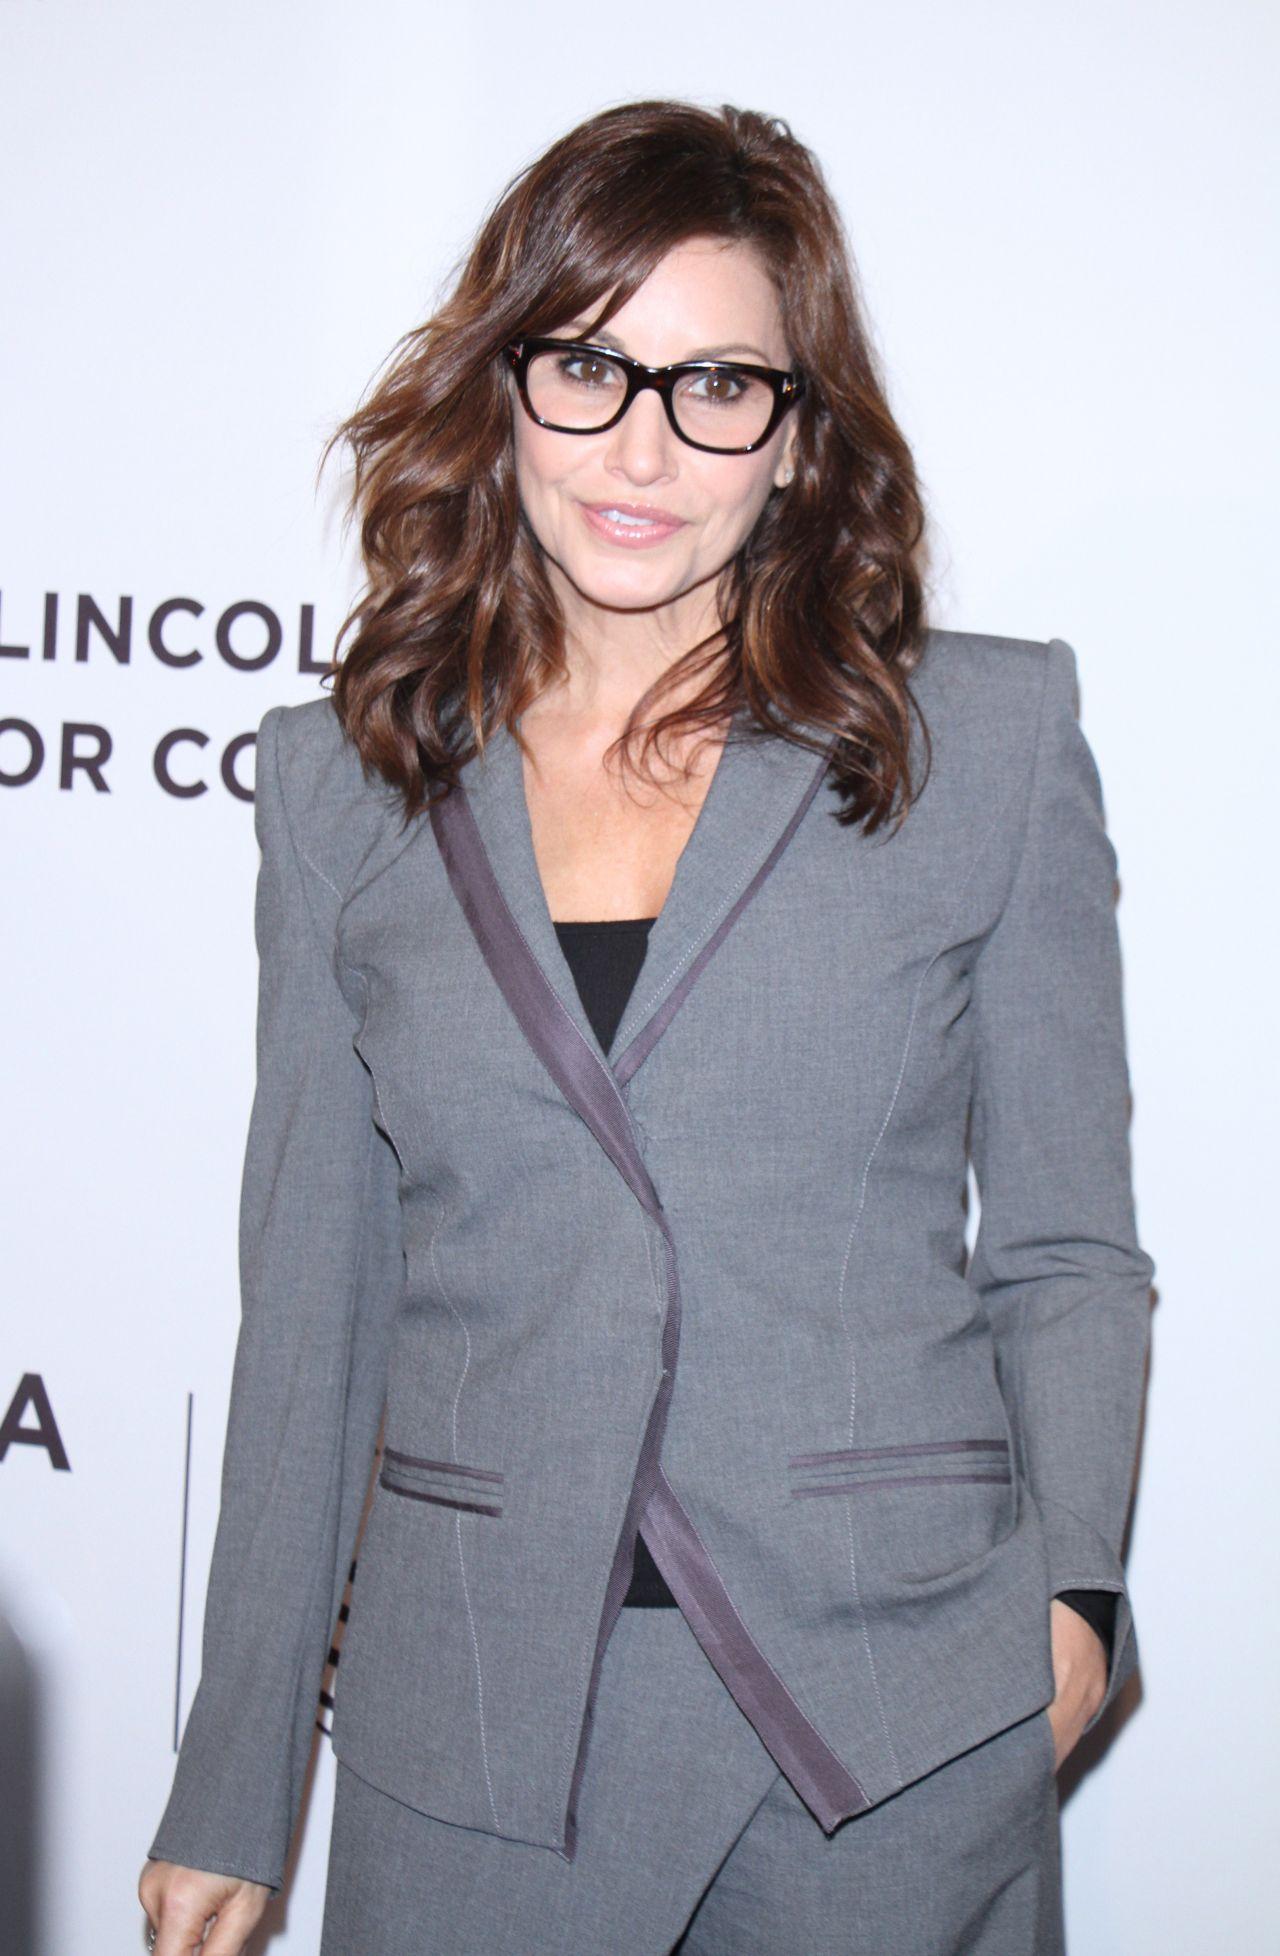 Gina gershon permission screening at tribeca film festival